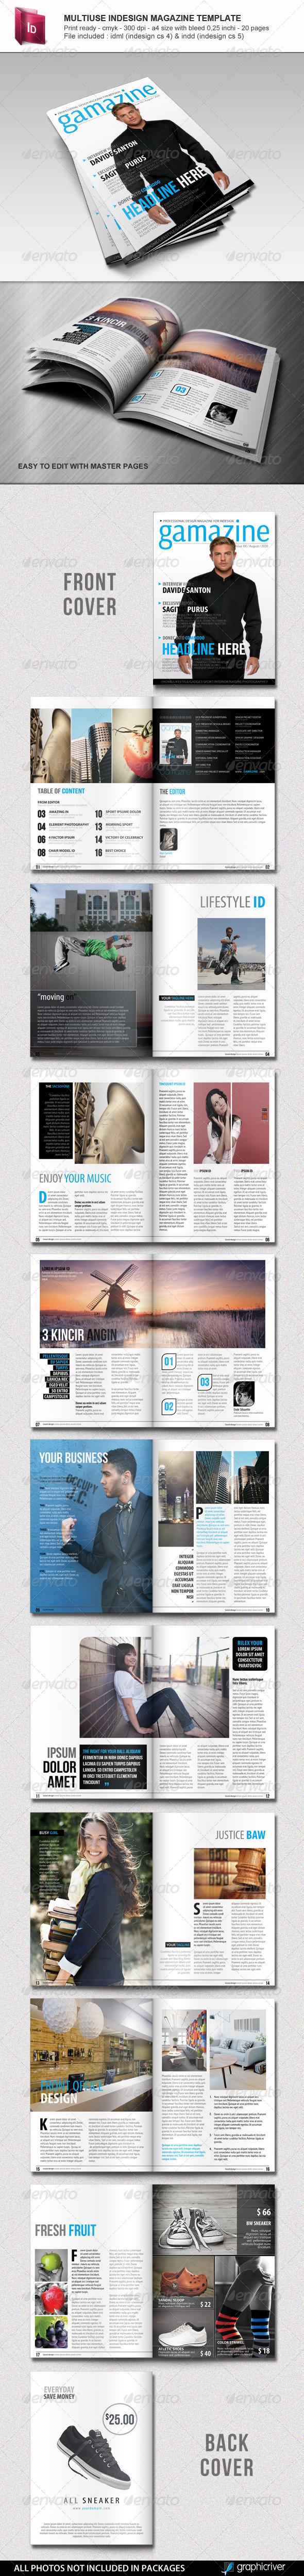 Multiuse Indesign Magazine Template - Magazines Print Templates